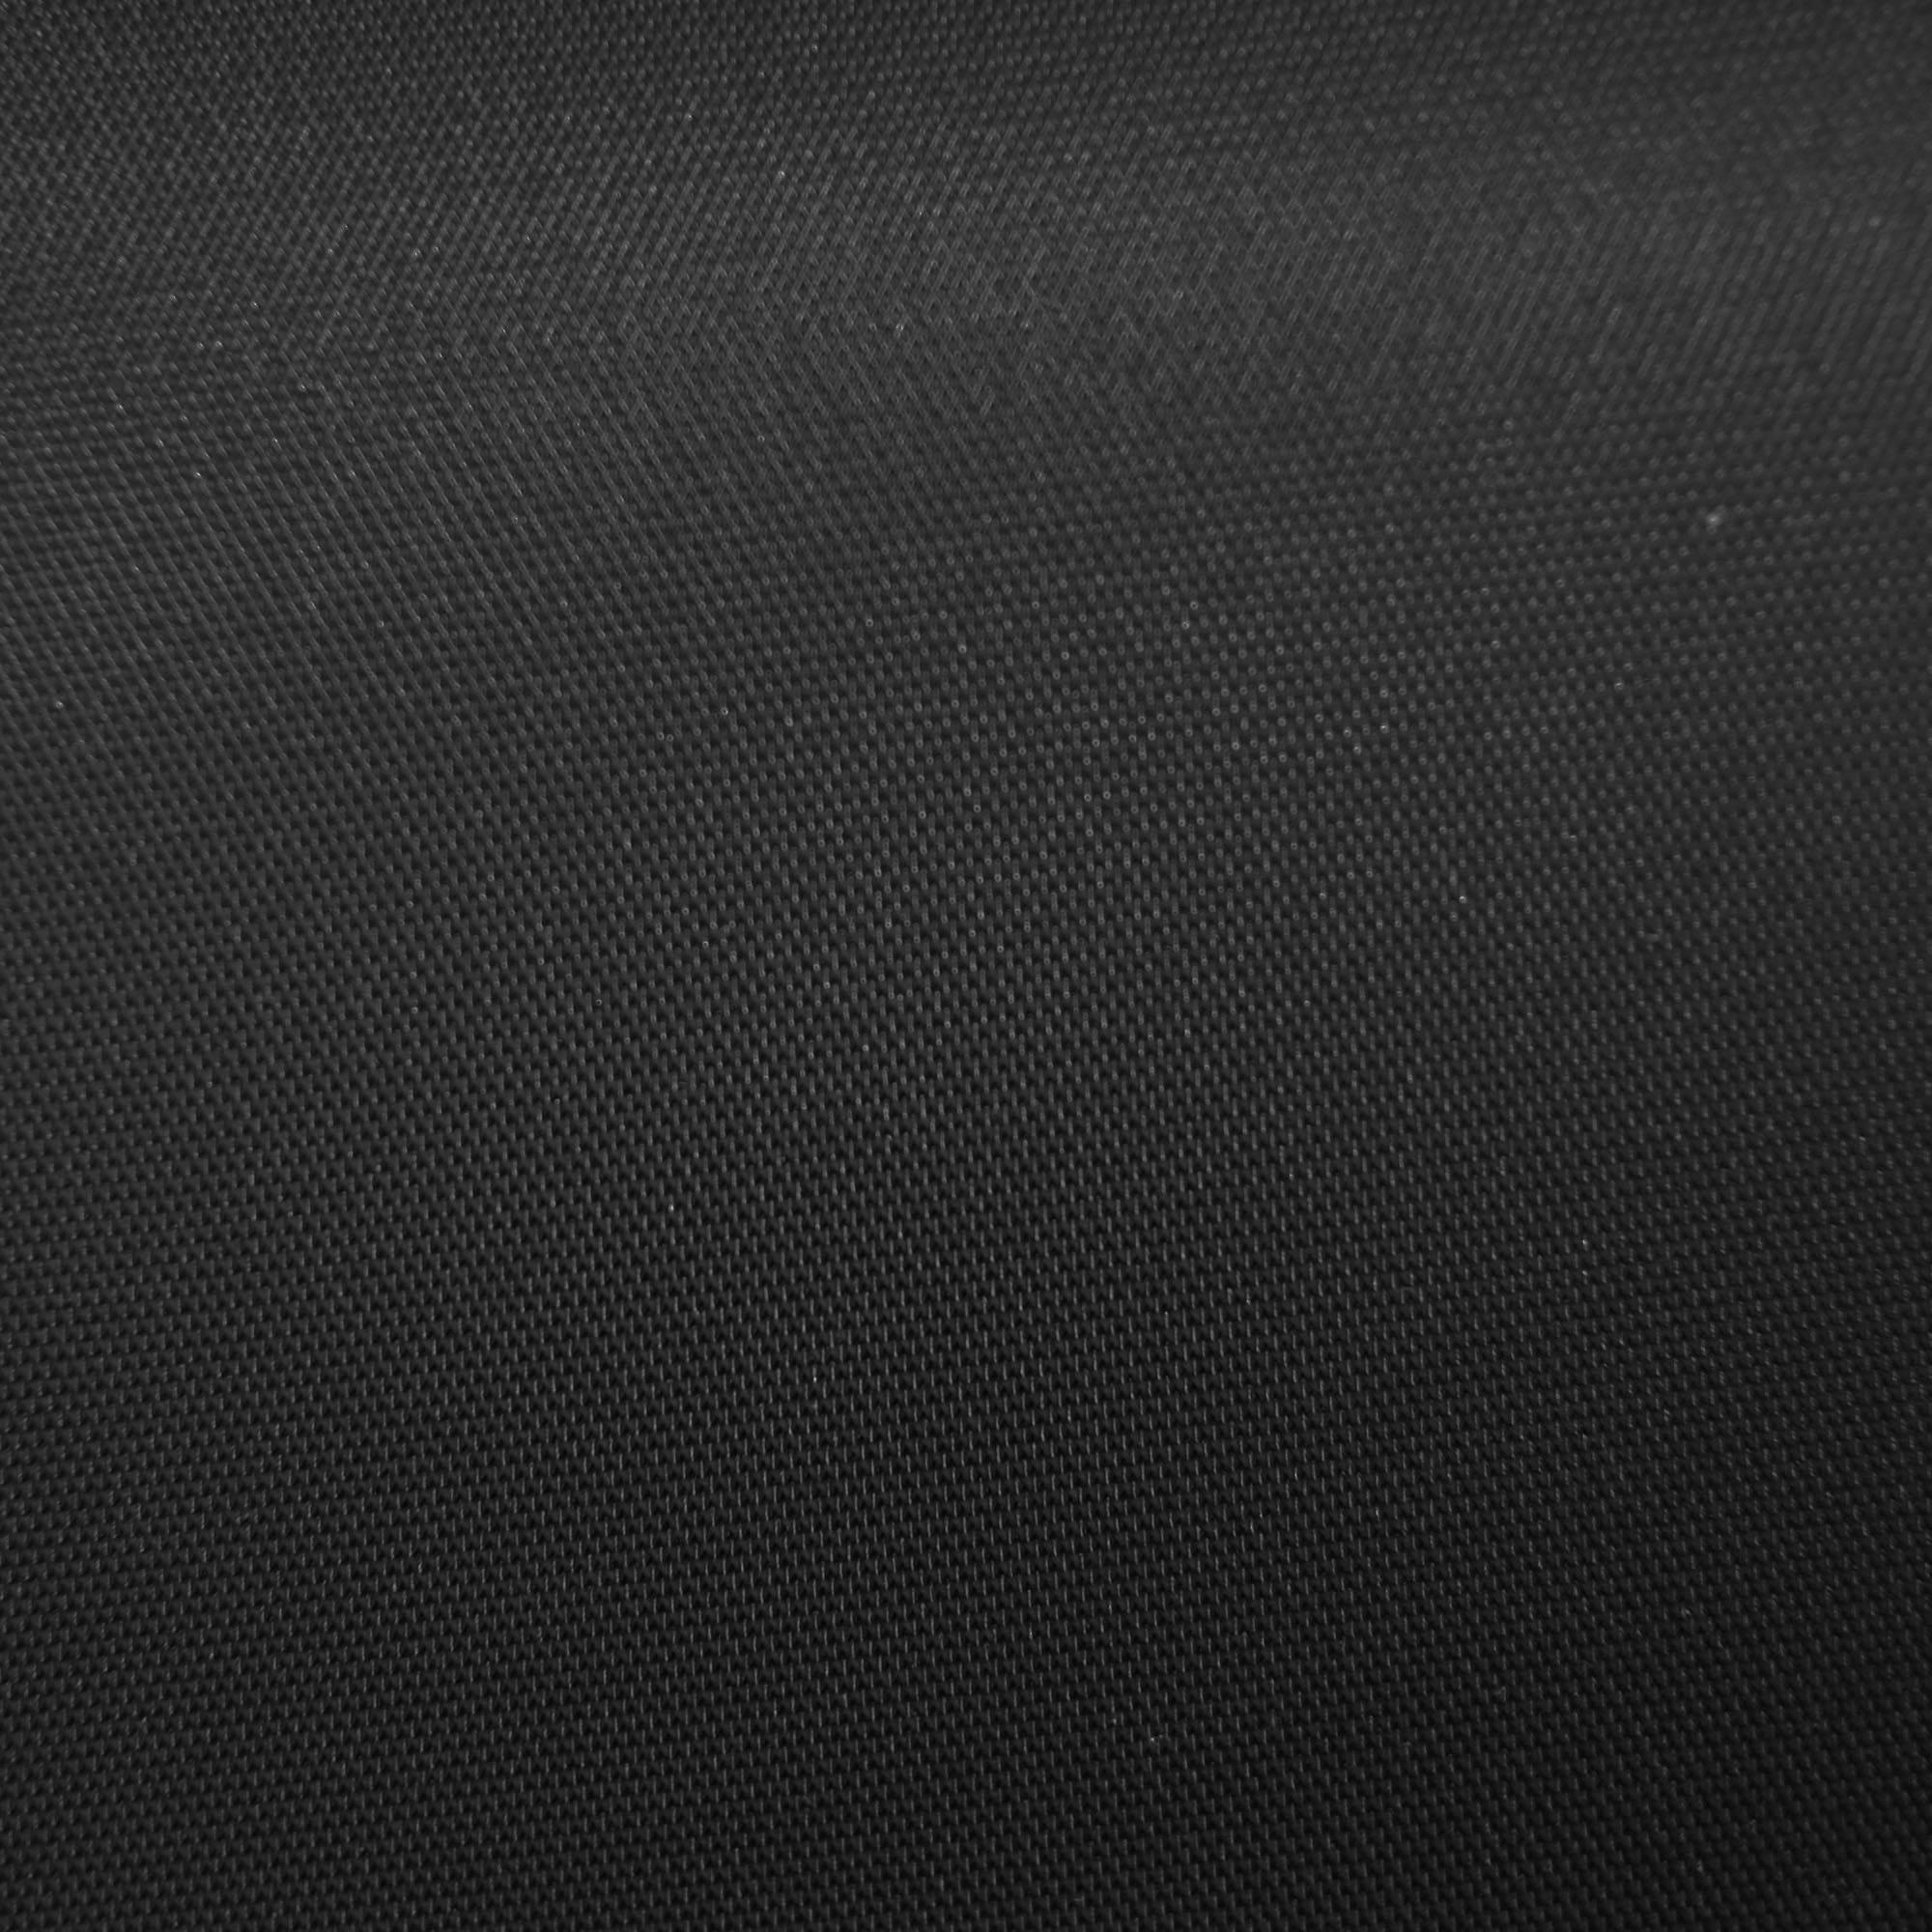 savage infinity vinyl background